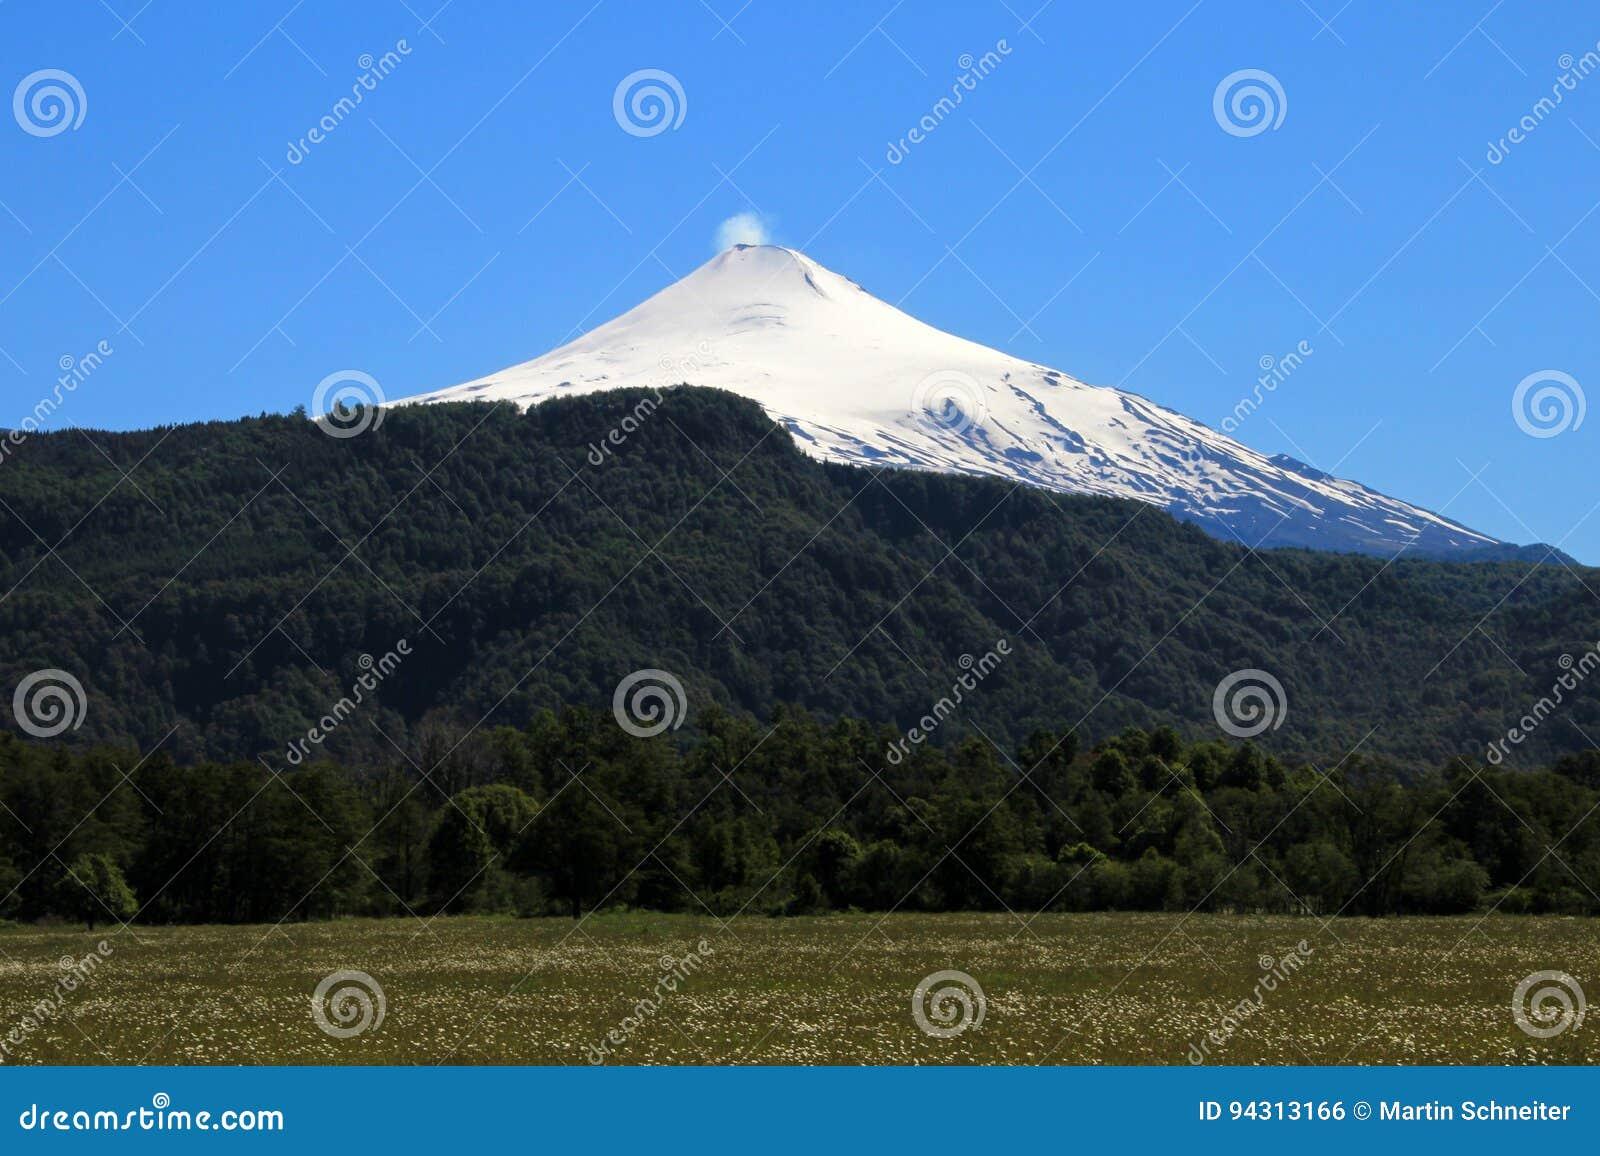 Sneeuw omvatte Volcano Villarica, Chili